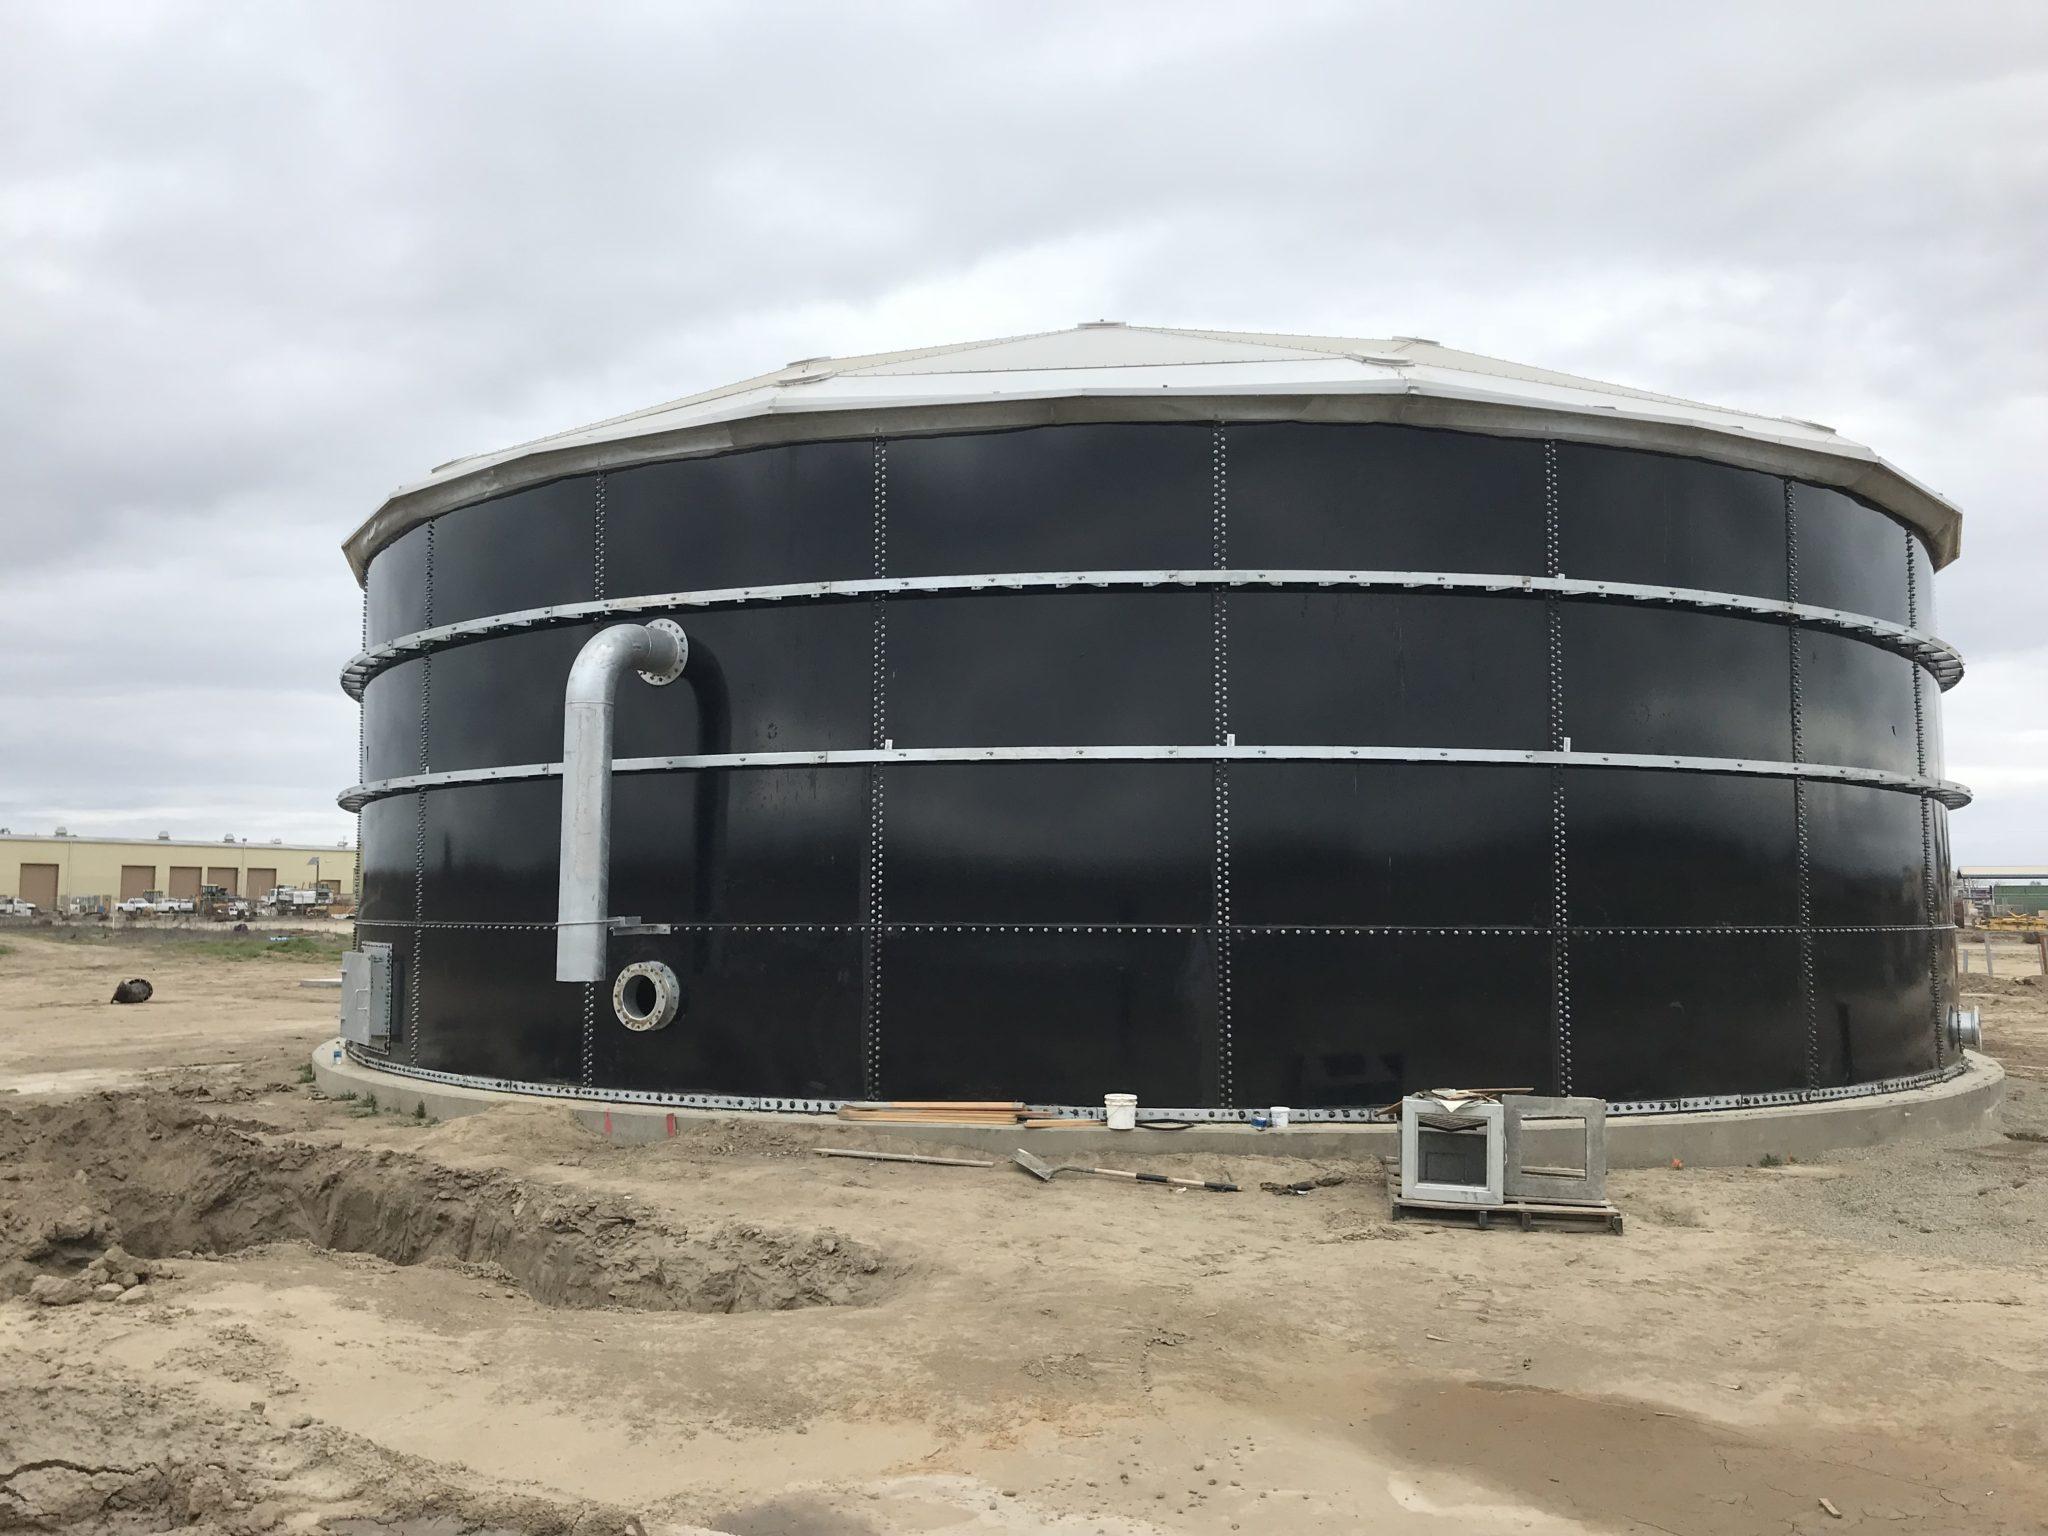 Dark blue bolted water storage tank in a dirt field